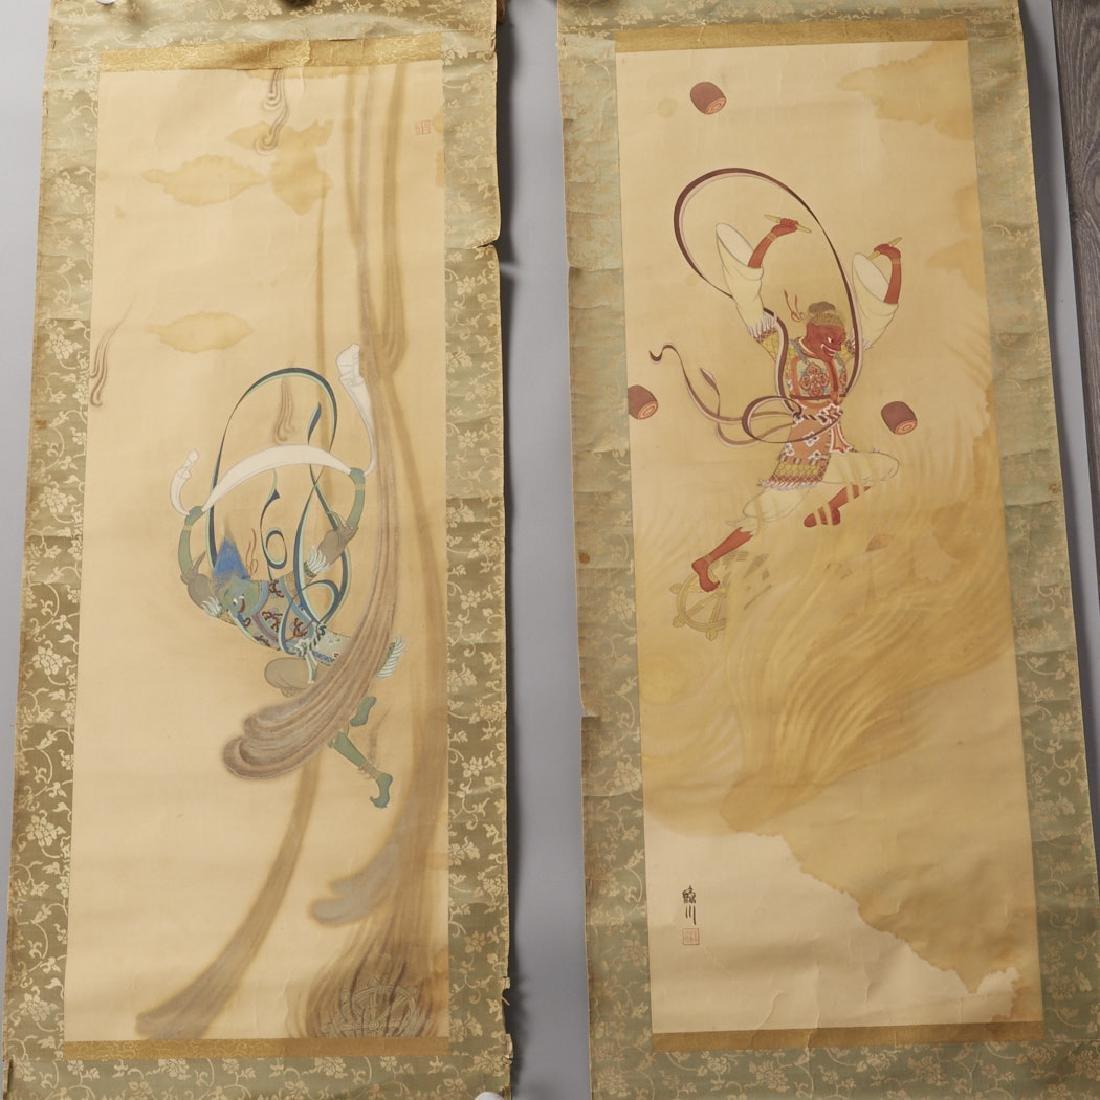 Japanese Scroll Paintings: Gods of Wind & Thunder